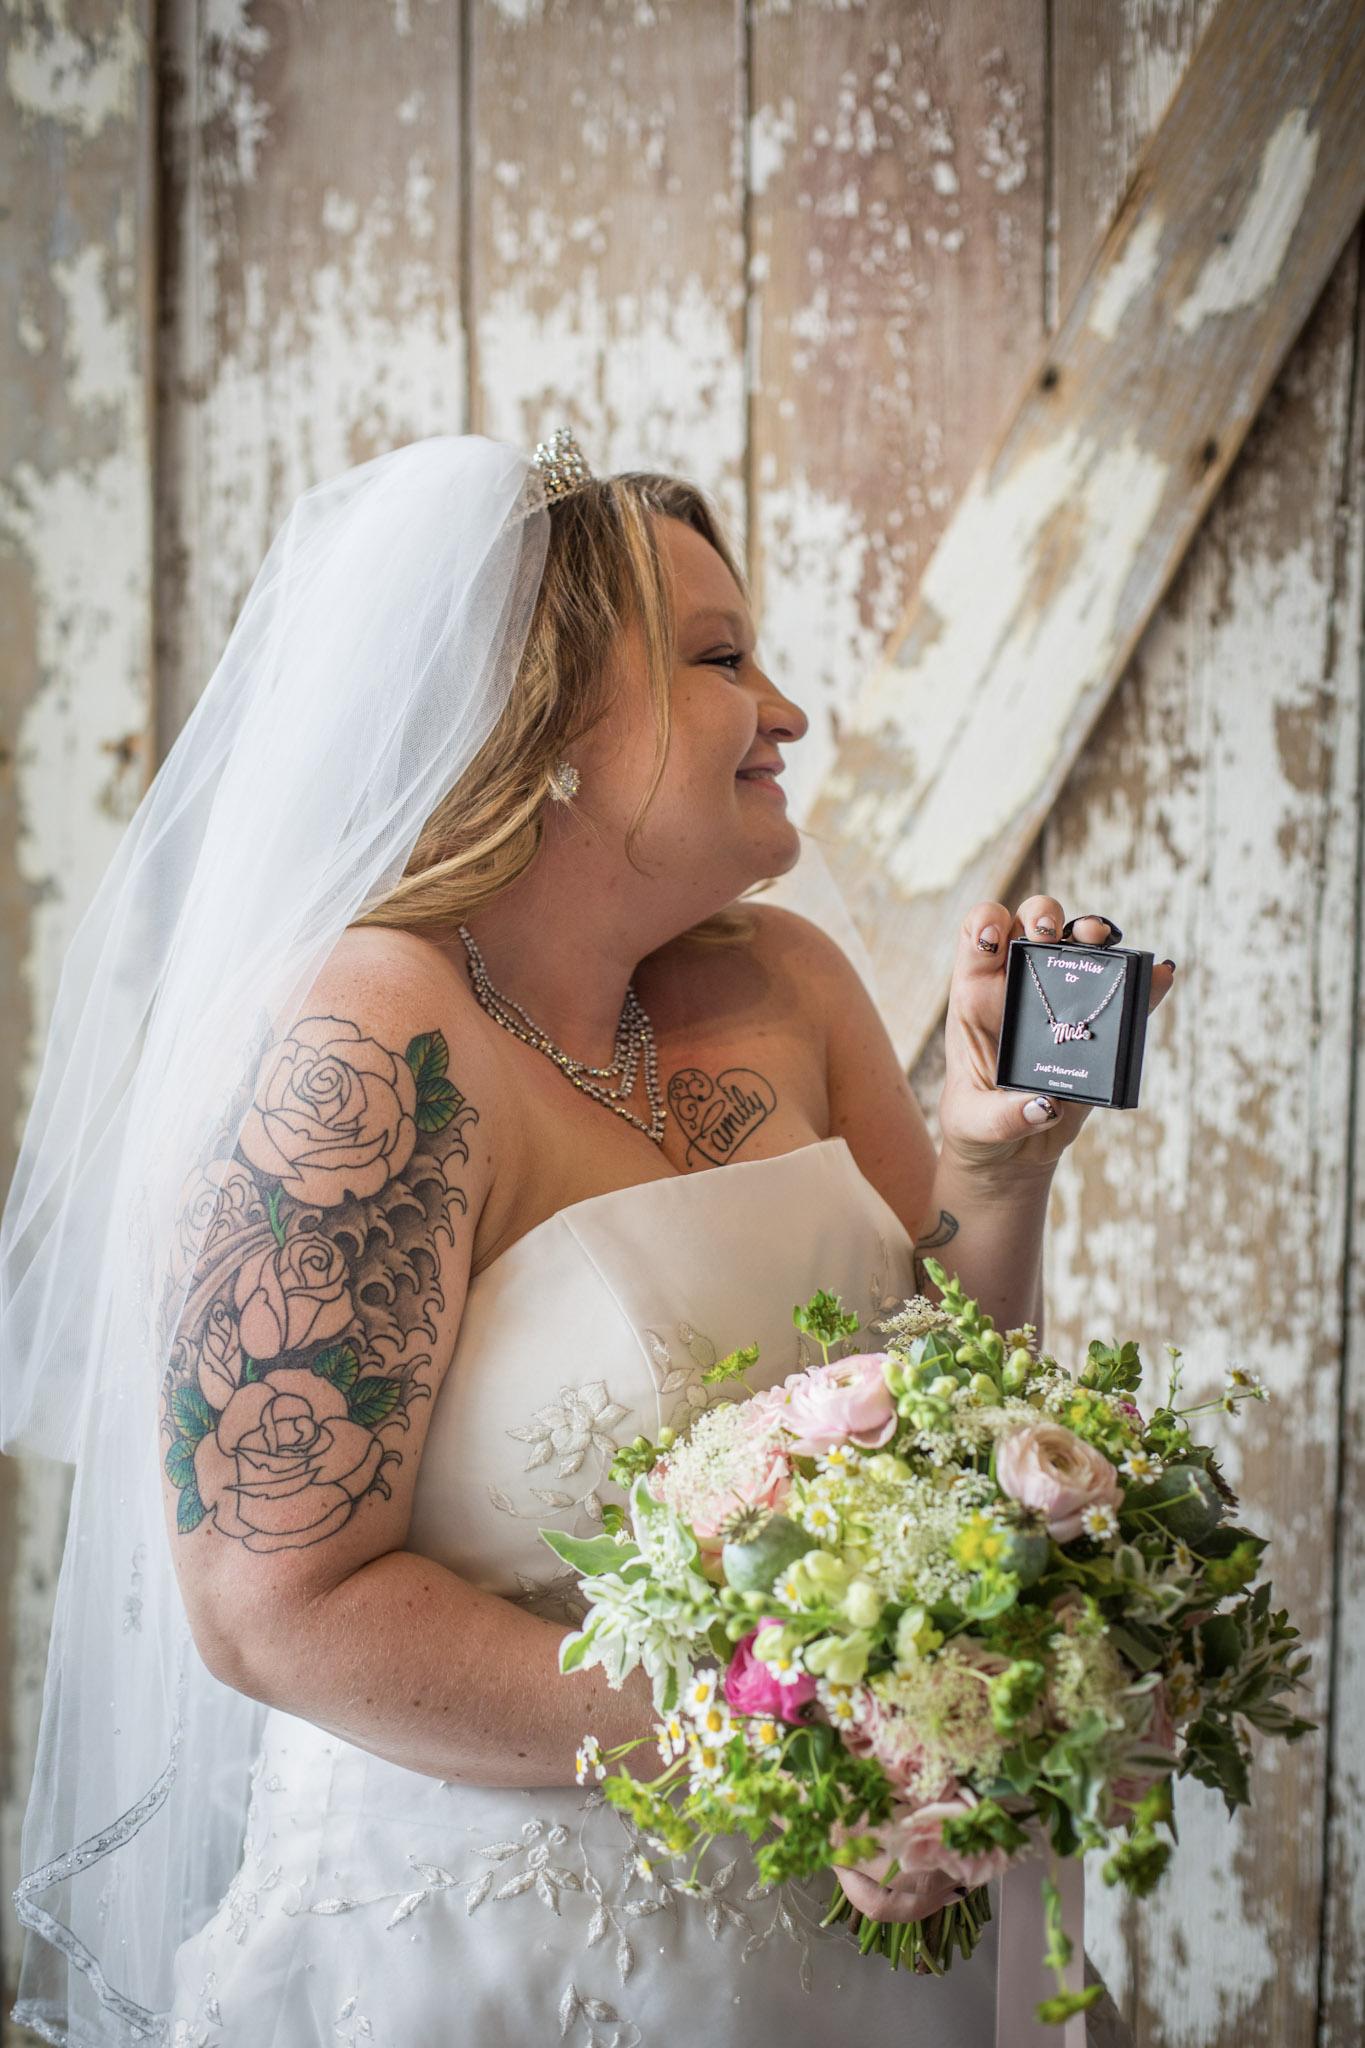 Kansas_City_Small_Wedding_Venue_Elope_Intimate_Ceremony_Budget_Affordable_Rachel&Blaze_144.jpg